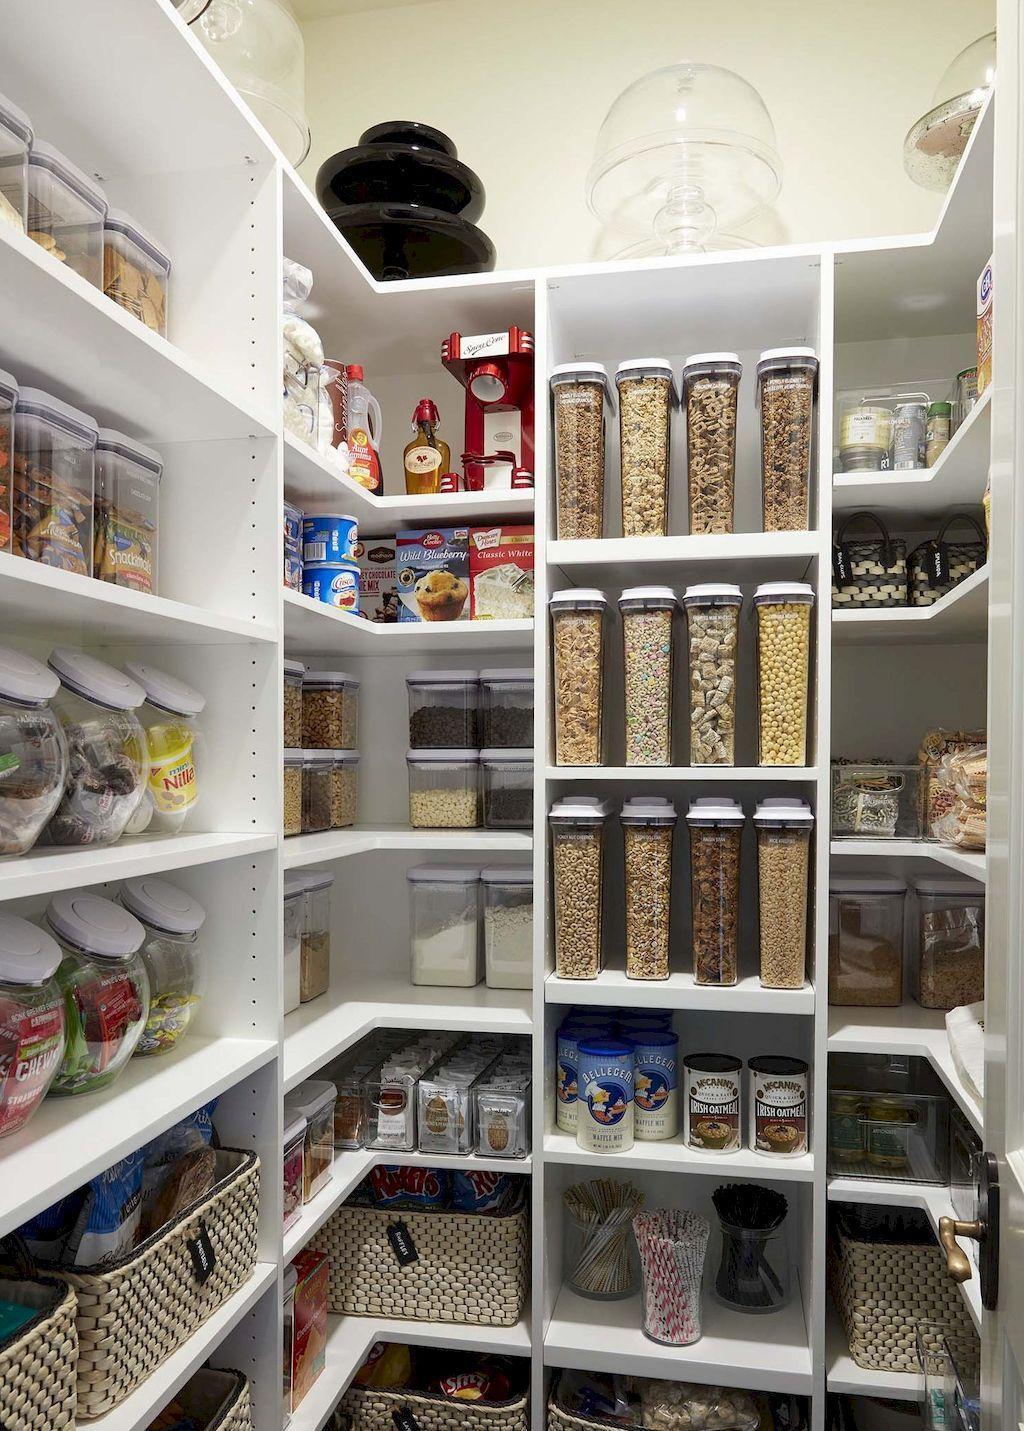 100 smart kitchen organization ideas for first apartment 40 pantry design kitchen on kitchen organization layout id=65848